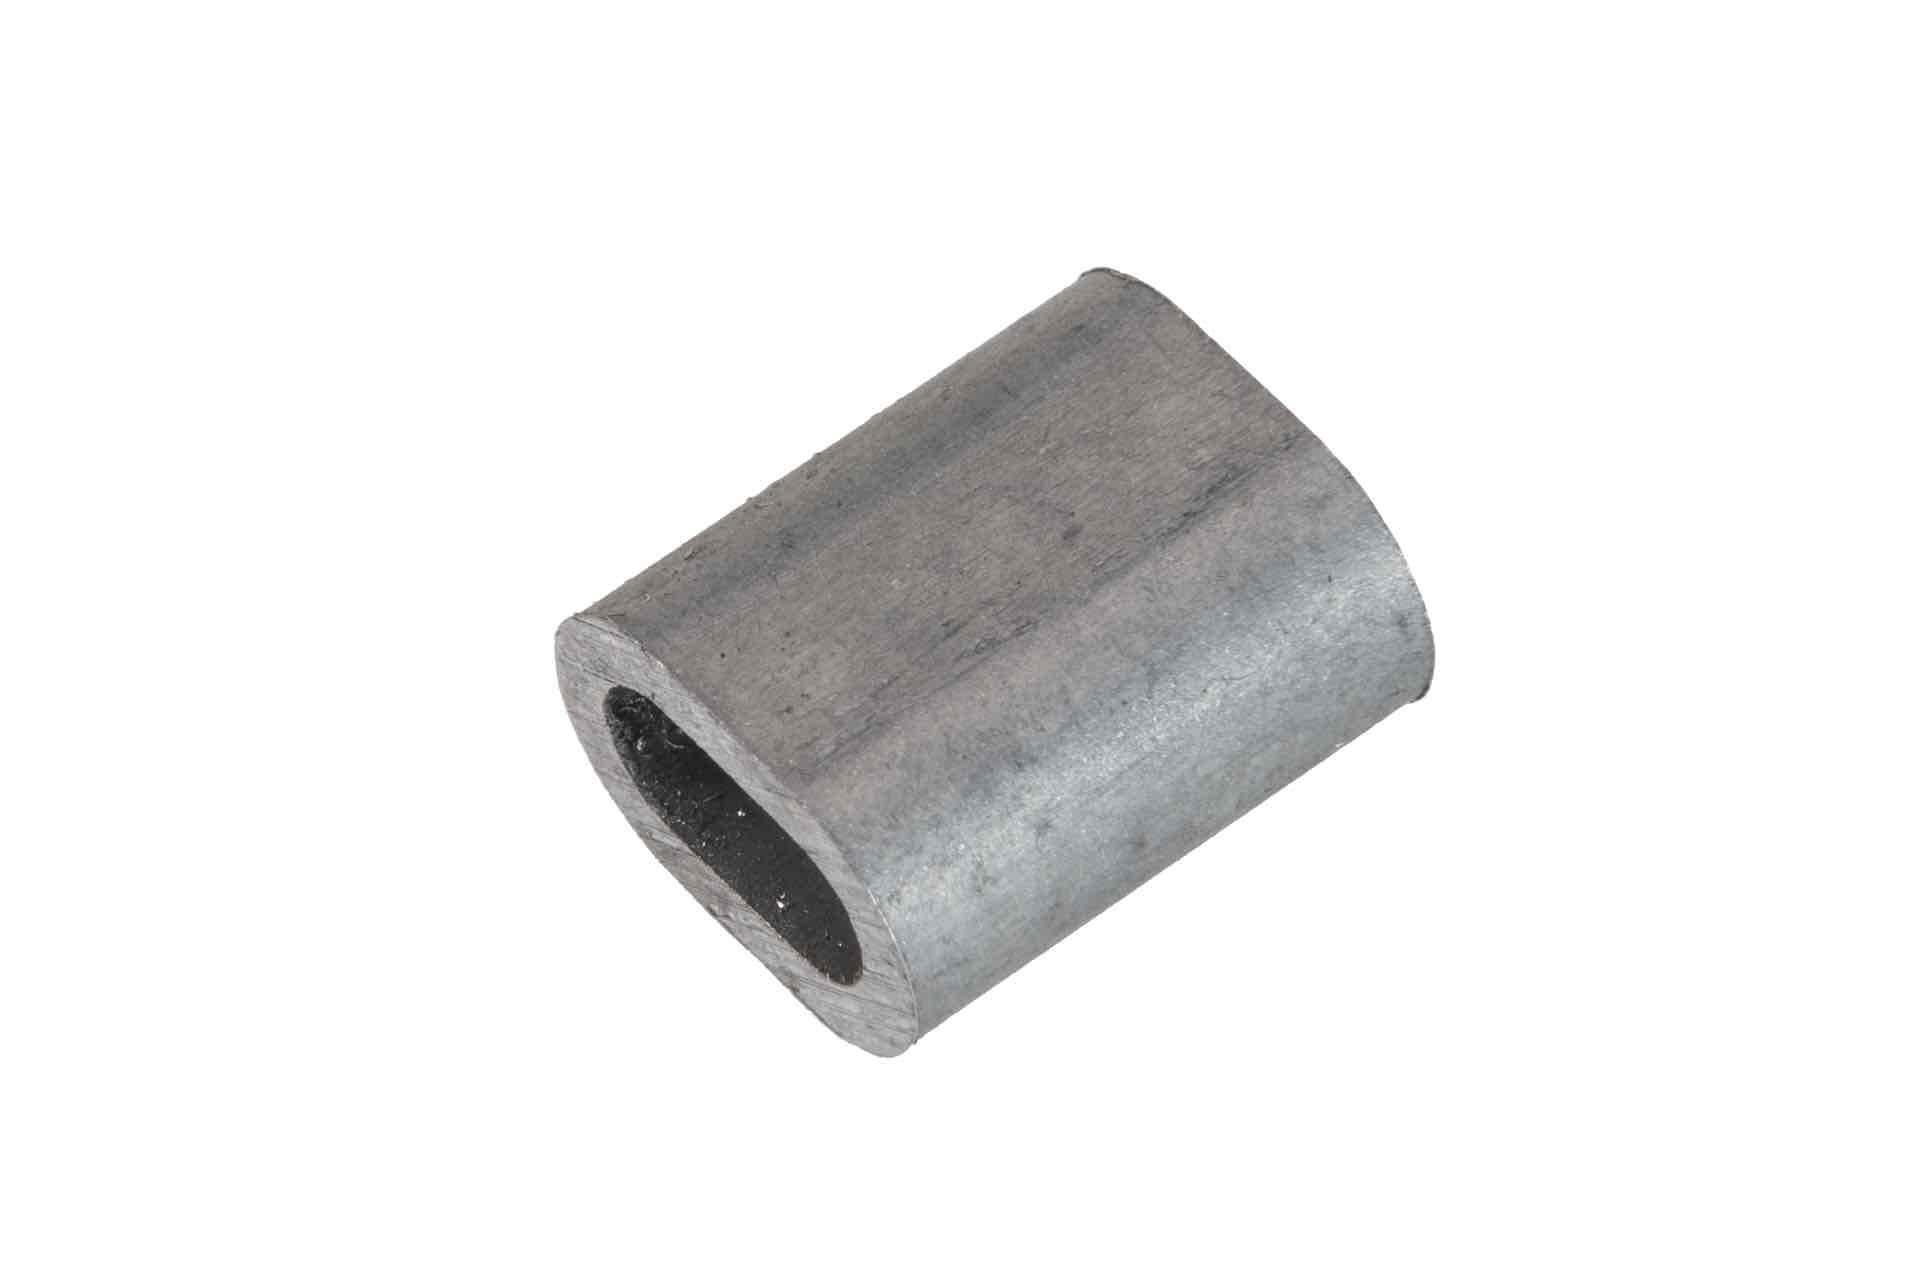 Knijphuls 3mm aluminium